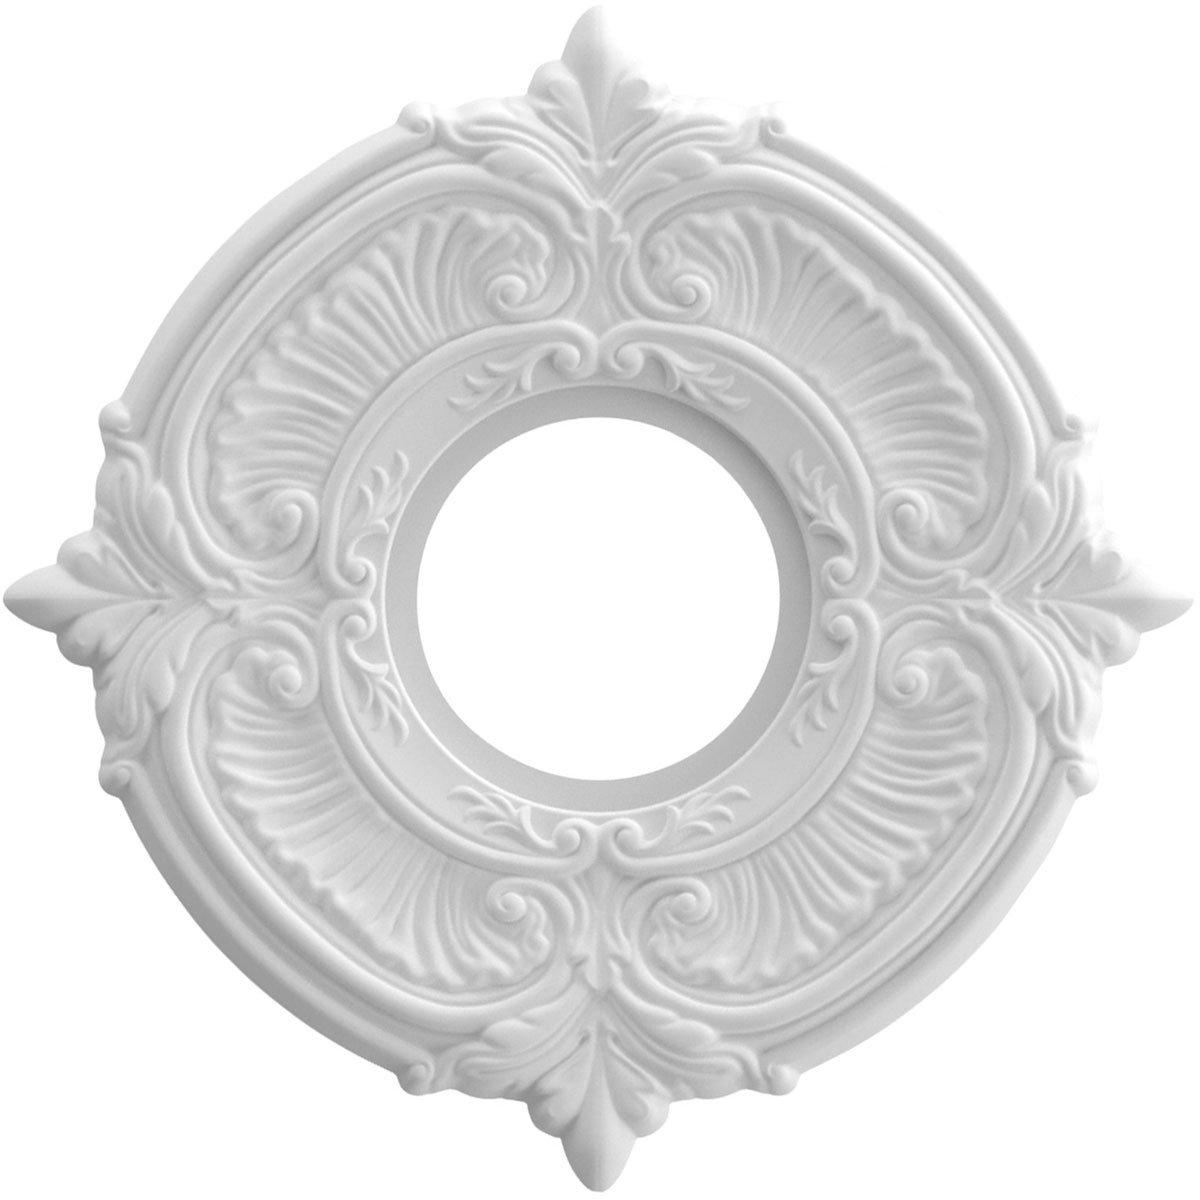 Ekena Millwork CMP10AT Attica Medallion Thermoformed Pvc Ceiling, 10'' OD x 3 1/2'' ID x 3/4'' P, White